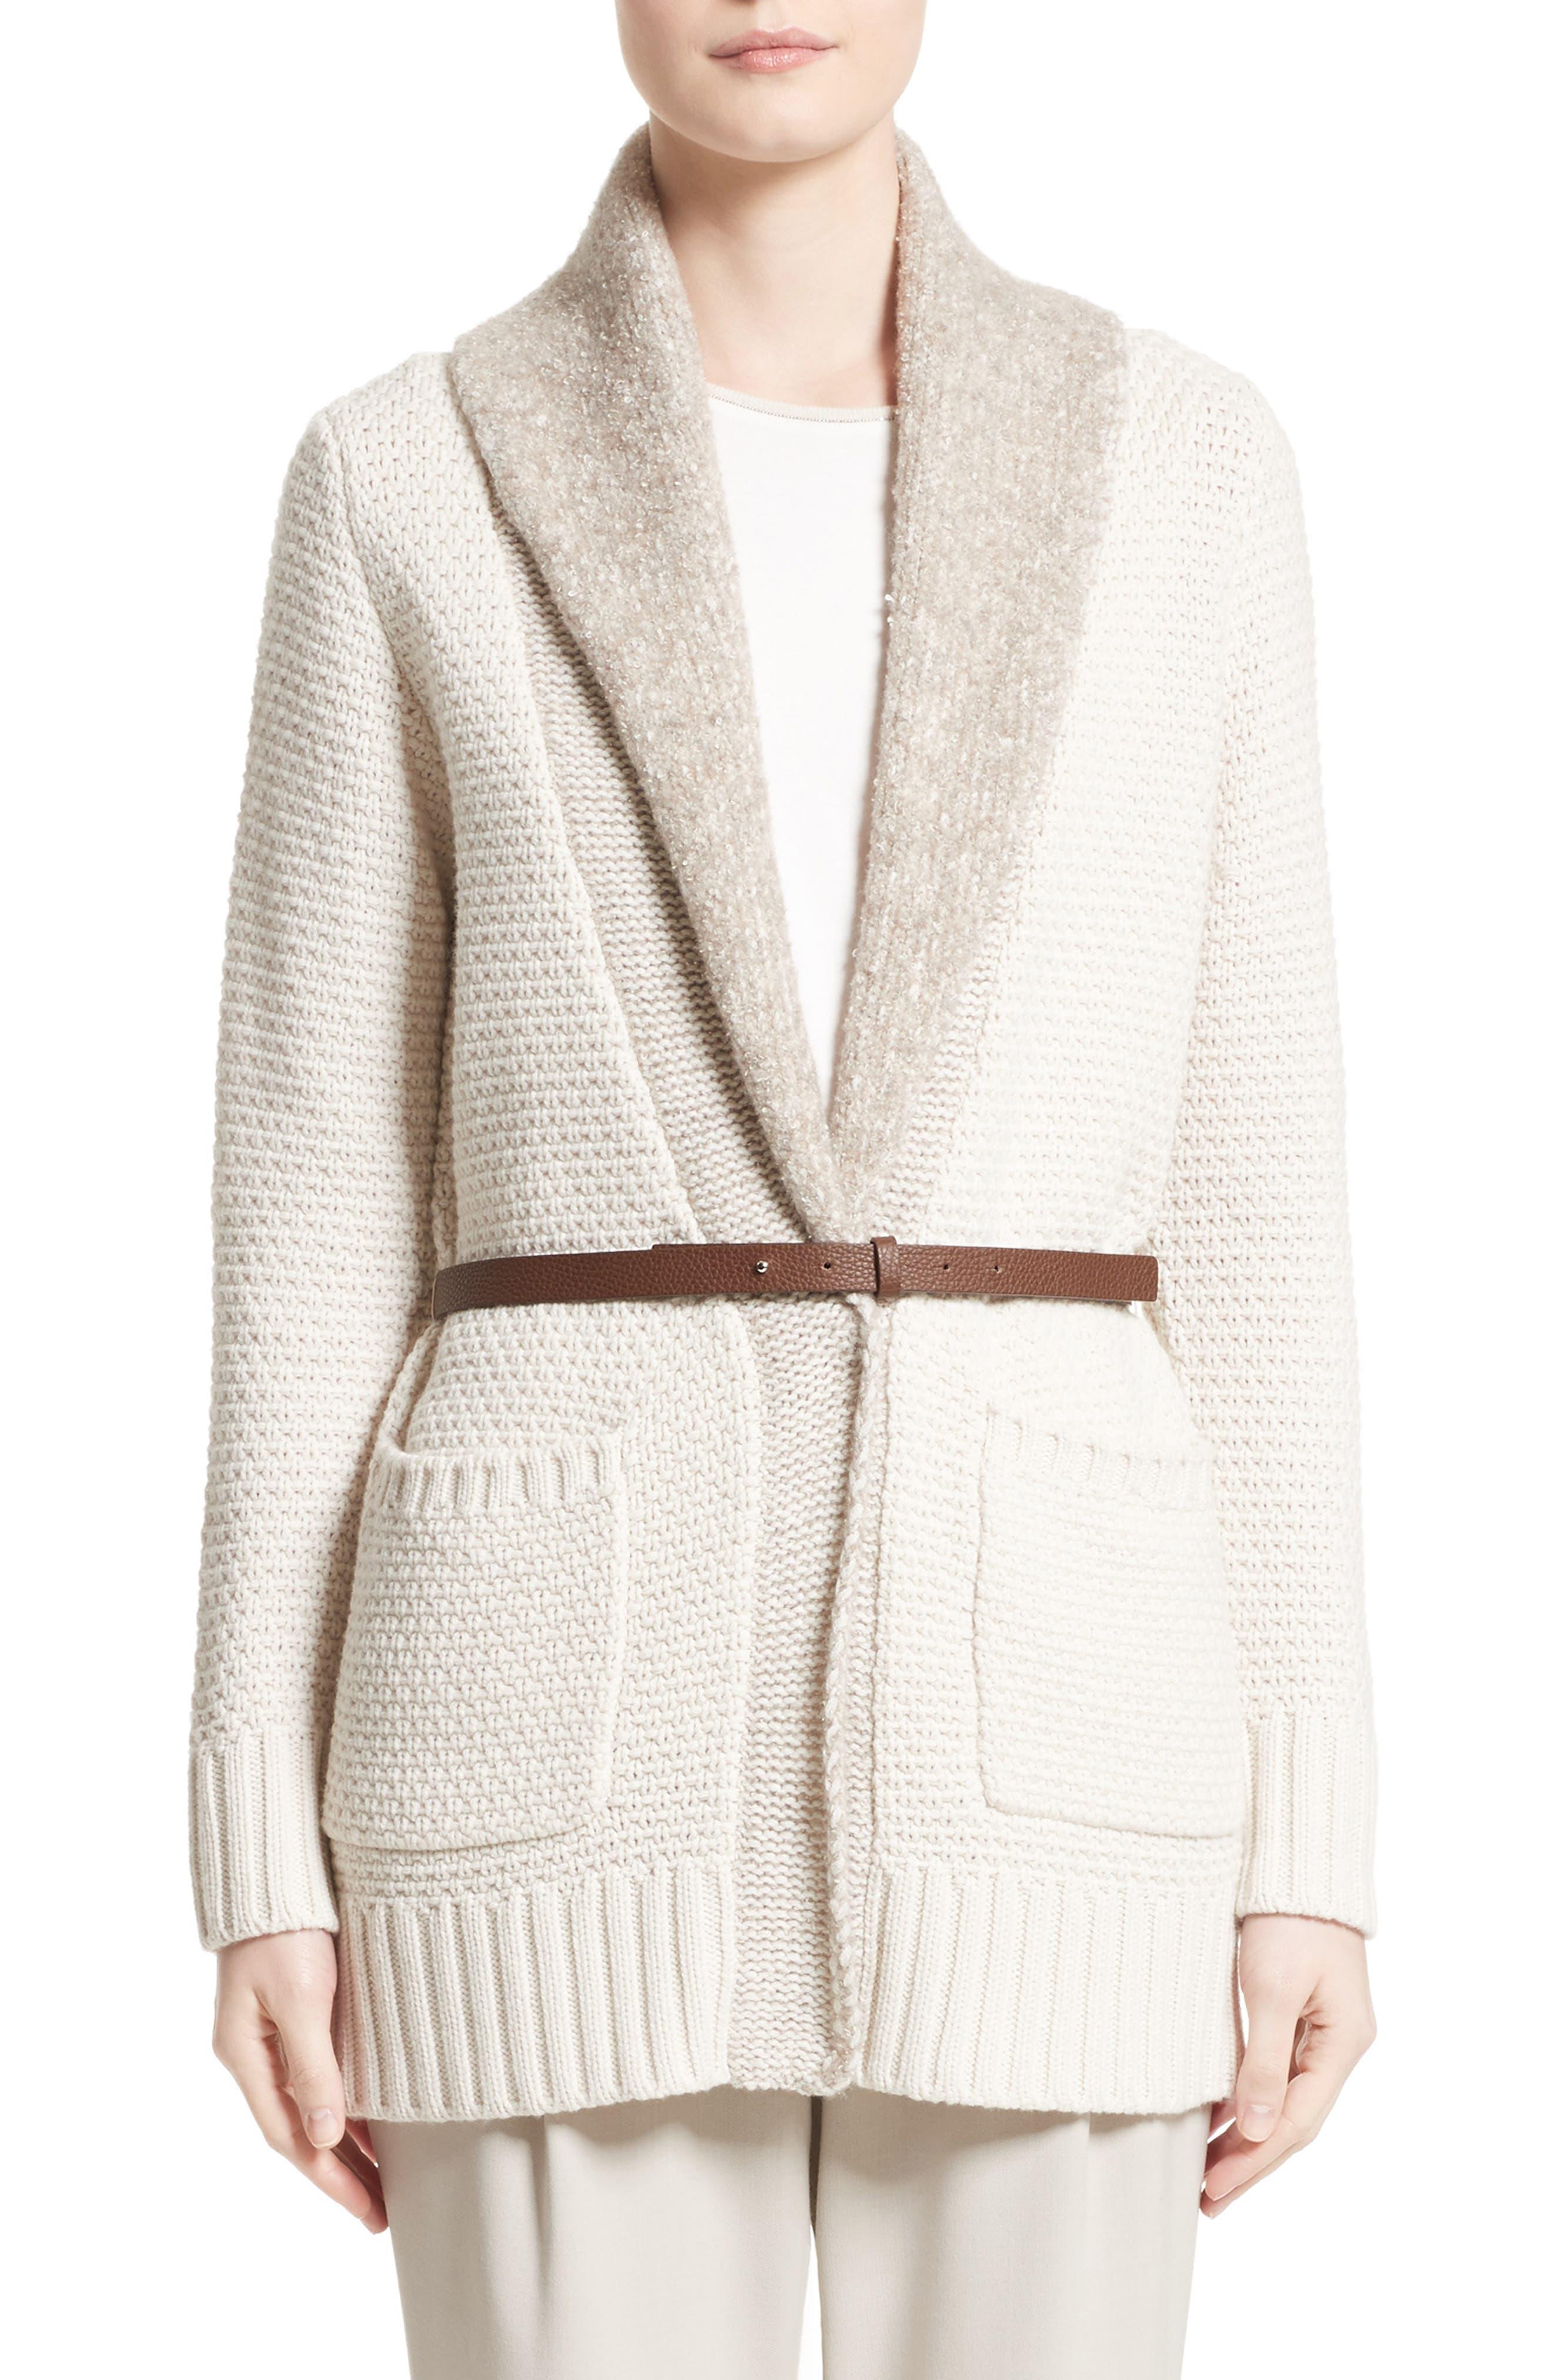 Alternate Image 1 Selected - Fabiana Filippi Wool, Silk & Cashmere Knit Cardigan